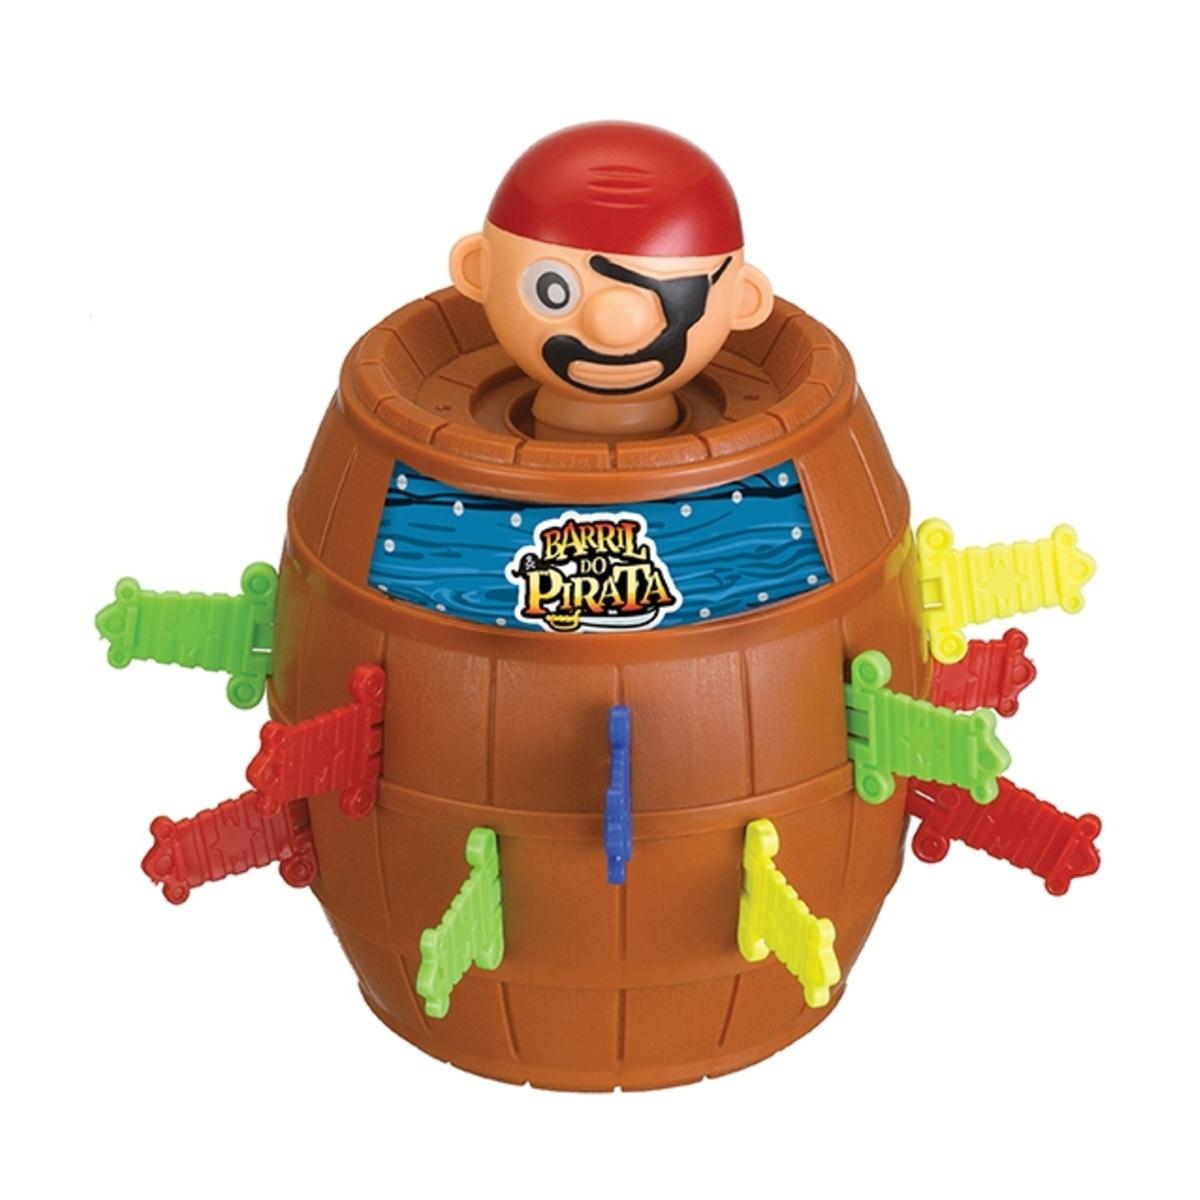 Brinquedo Barril do Pirata 18X13cm Art Brink